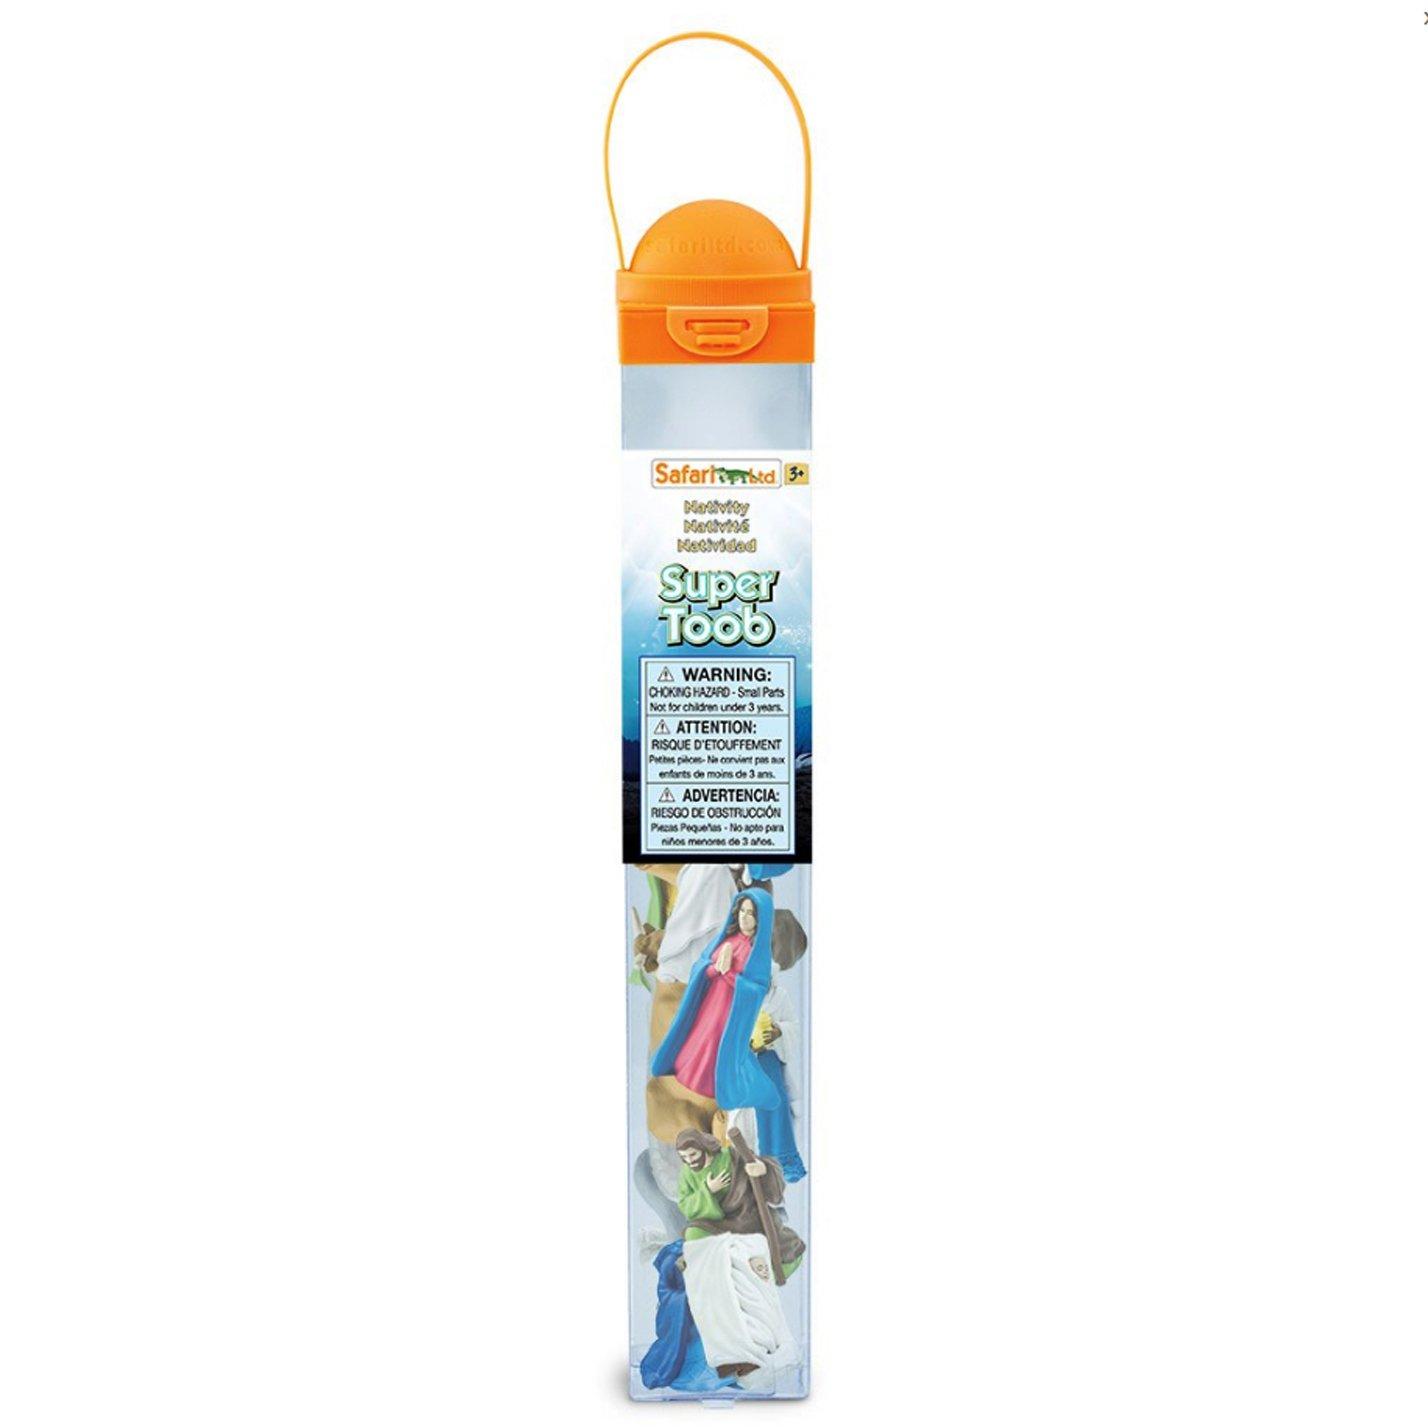 Safari Ltd. Nativity SuperTOOB - Quality Construction from Safe and BPA Free Materials